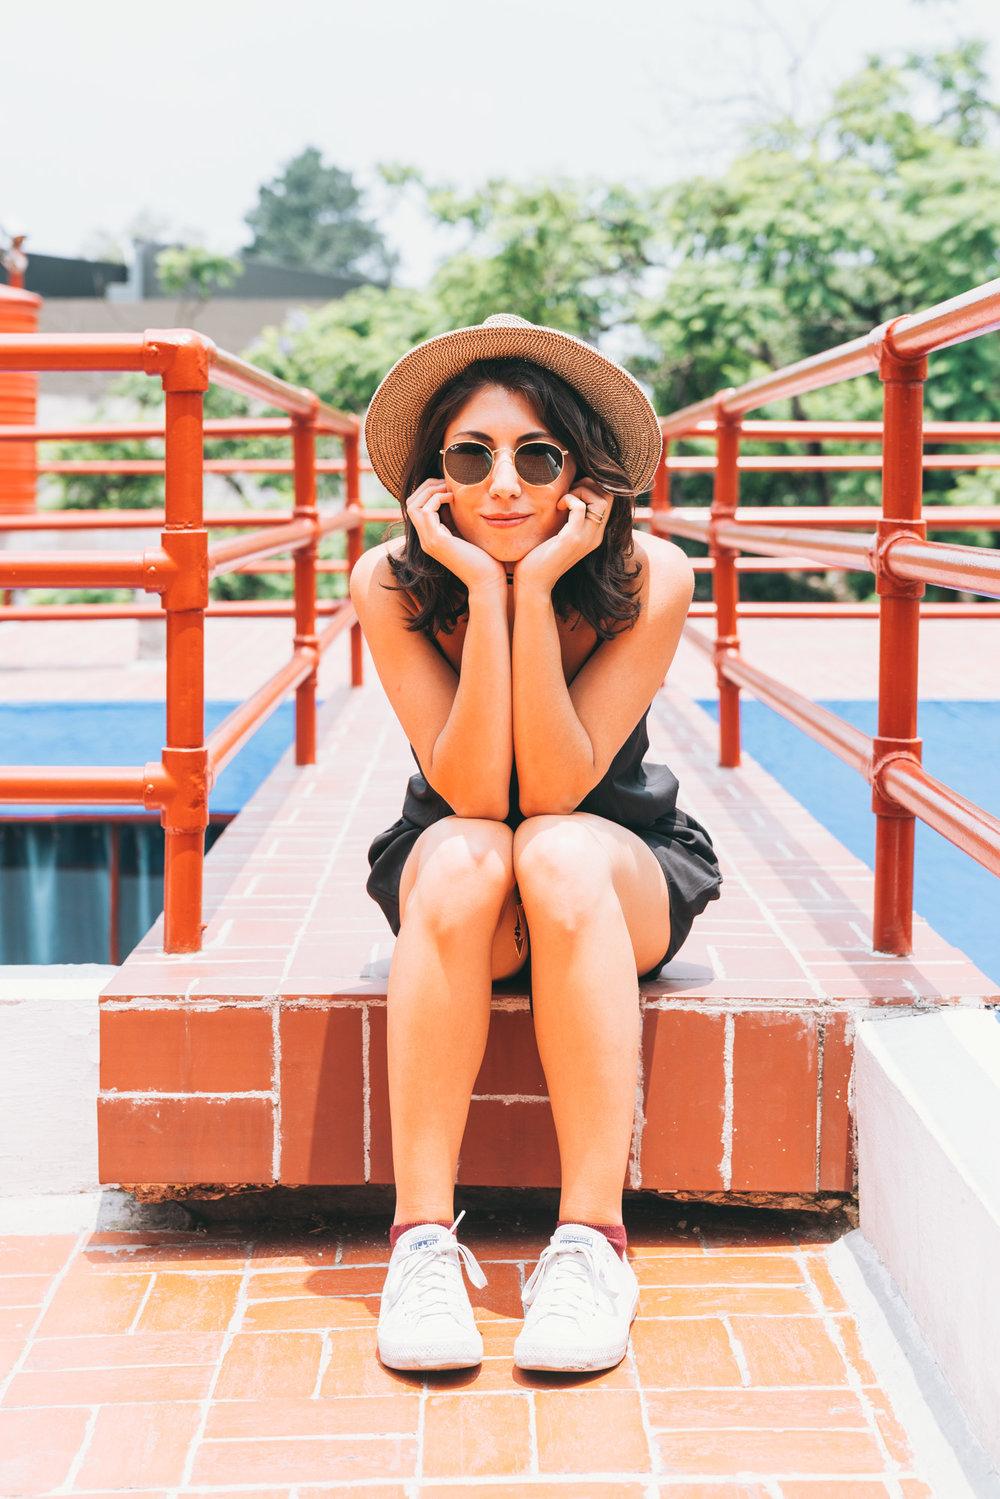 jess sitting on the love bridge